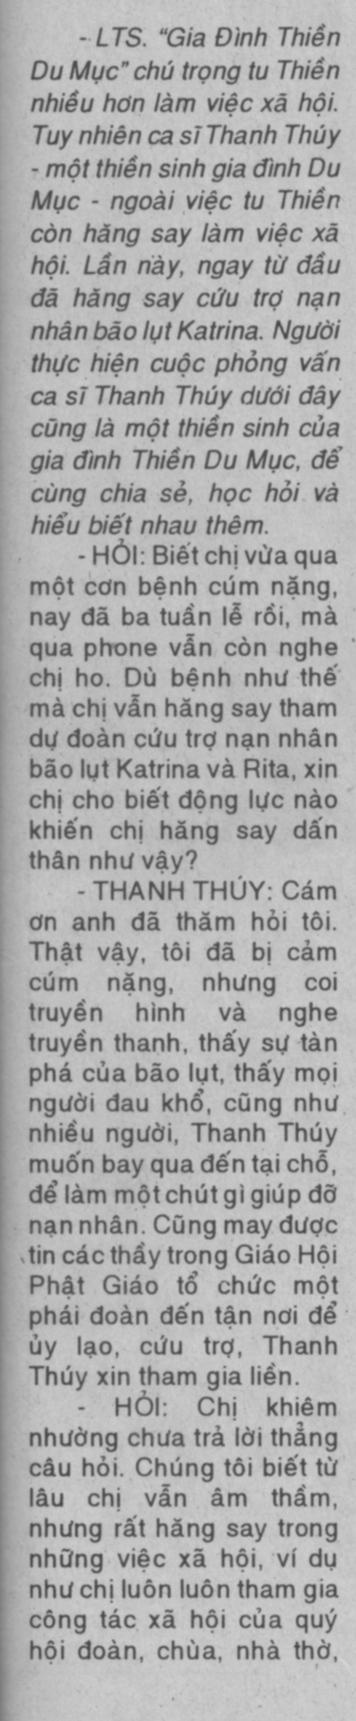 Gia dinh Thien Du Muc tham gia cuu lut copy_2